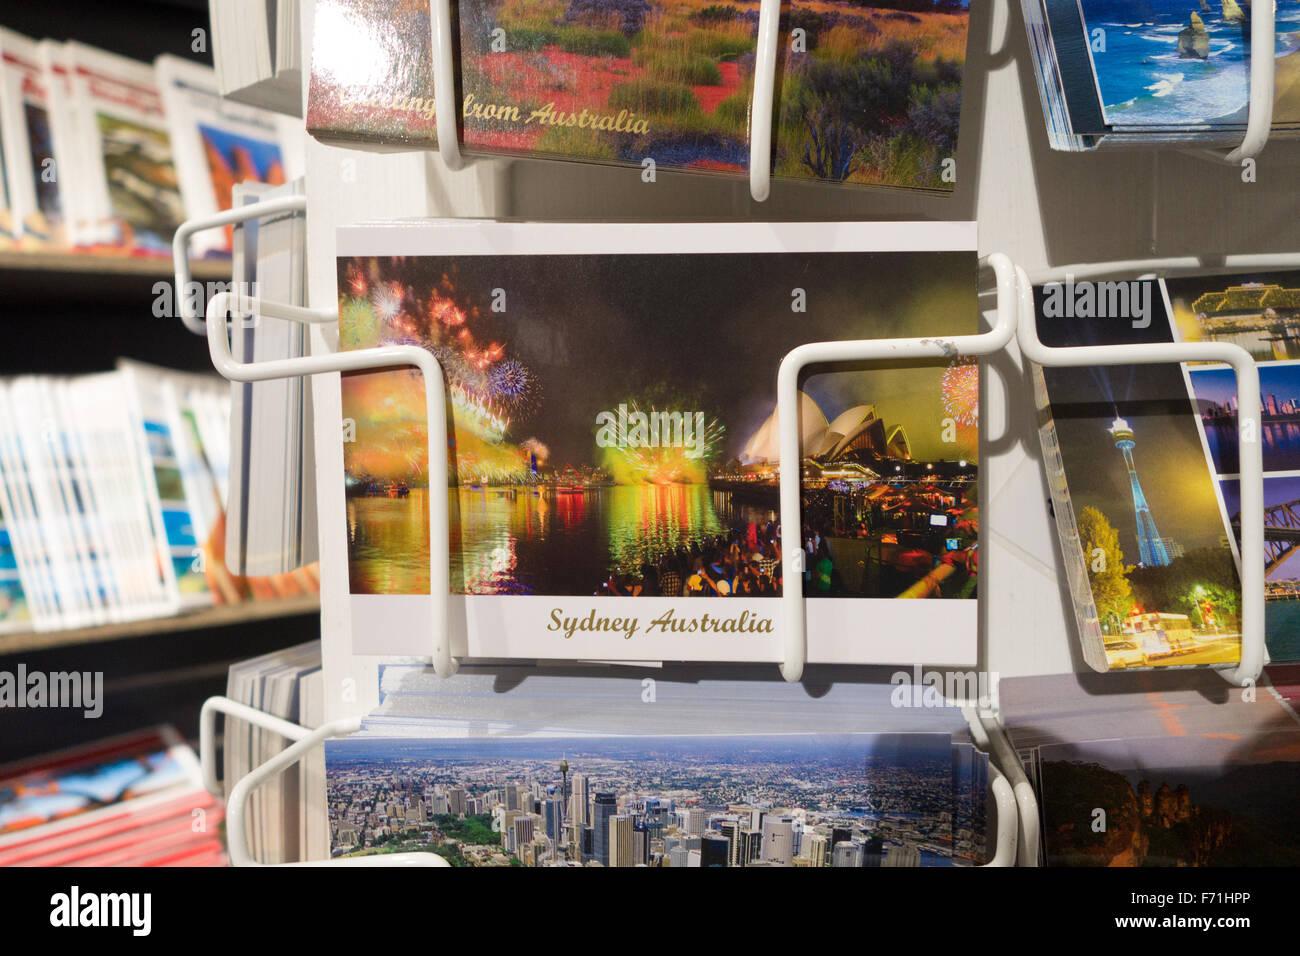 Sydney postcards - Stock Image